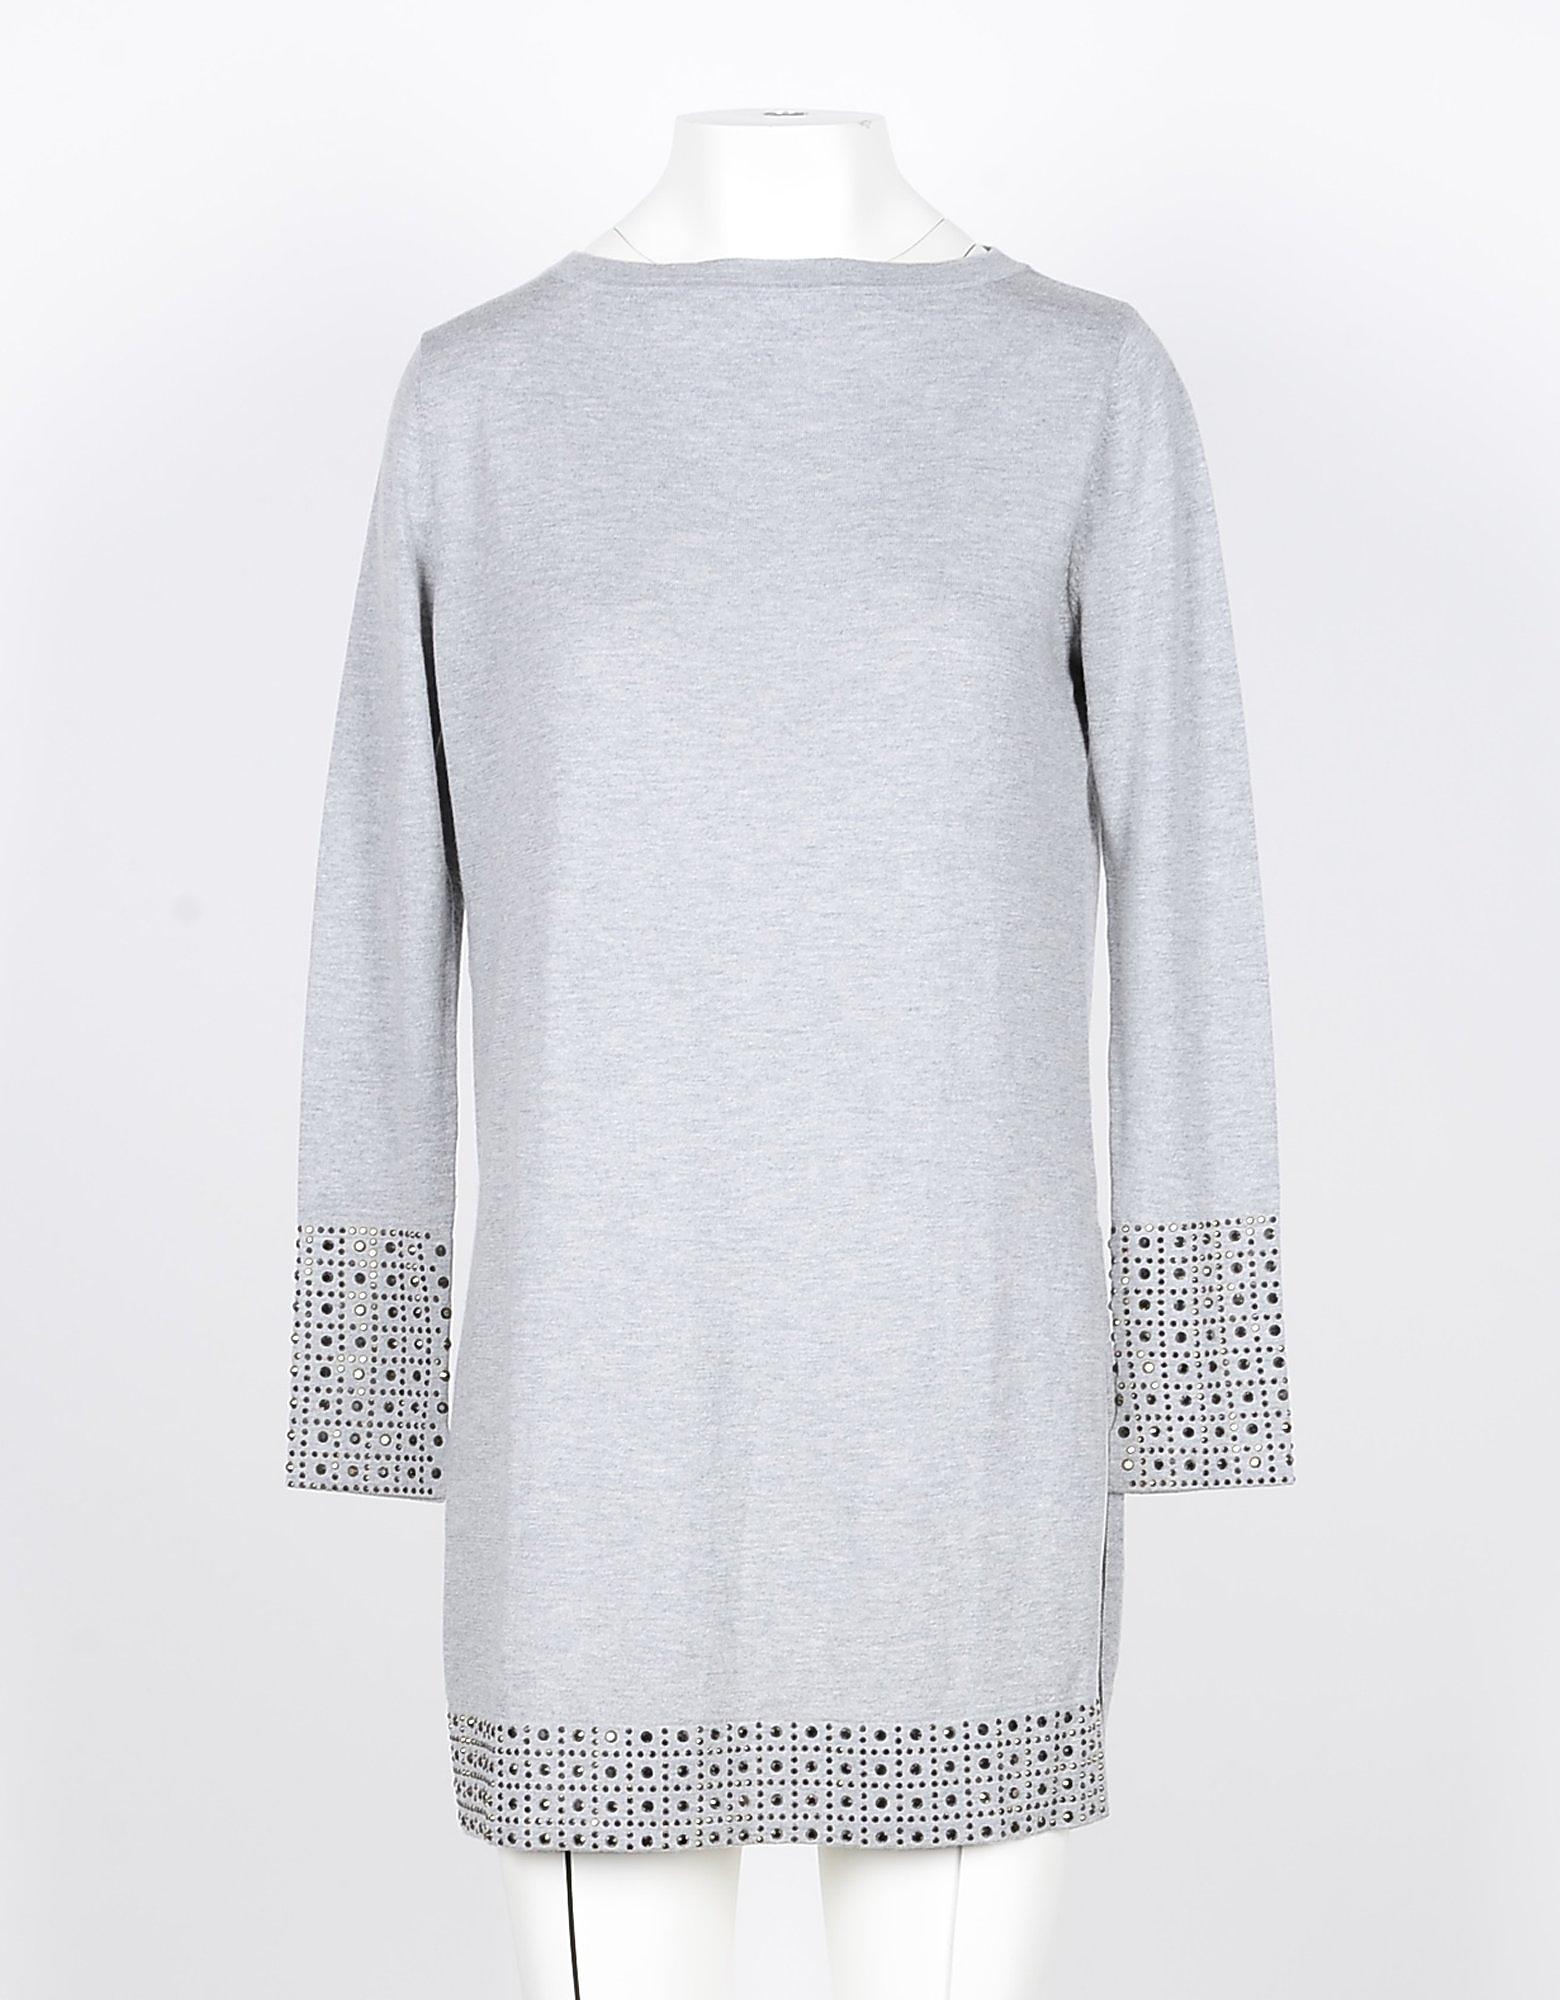 SNOBBY SHEEP Designer Knitwear, Light Gray Silk and Cashmere Blend Women's Long Sweater